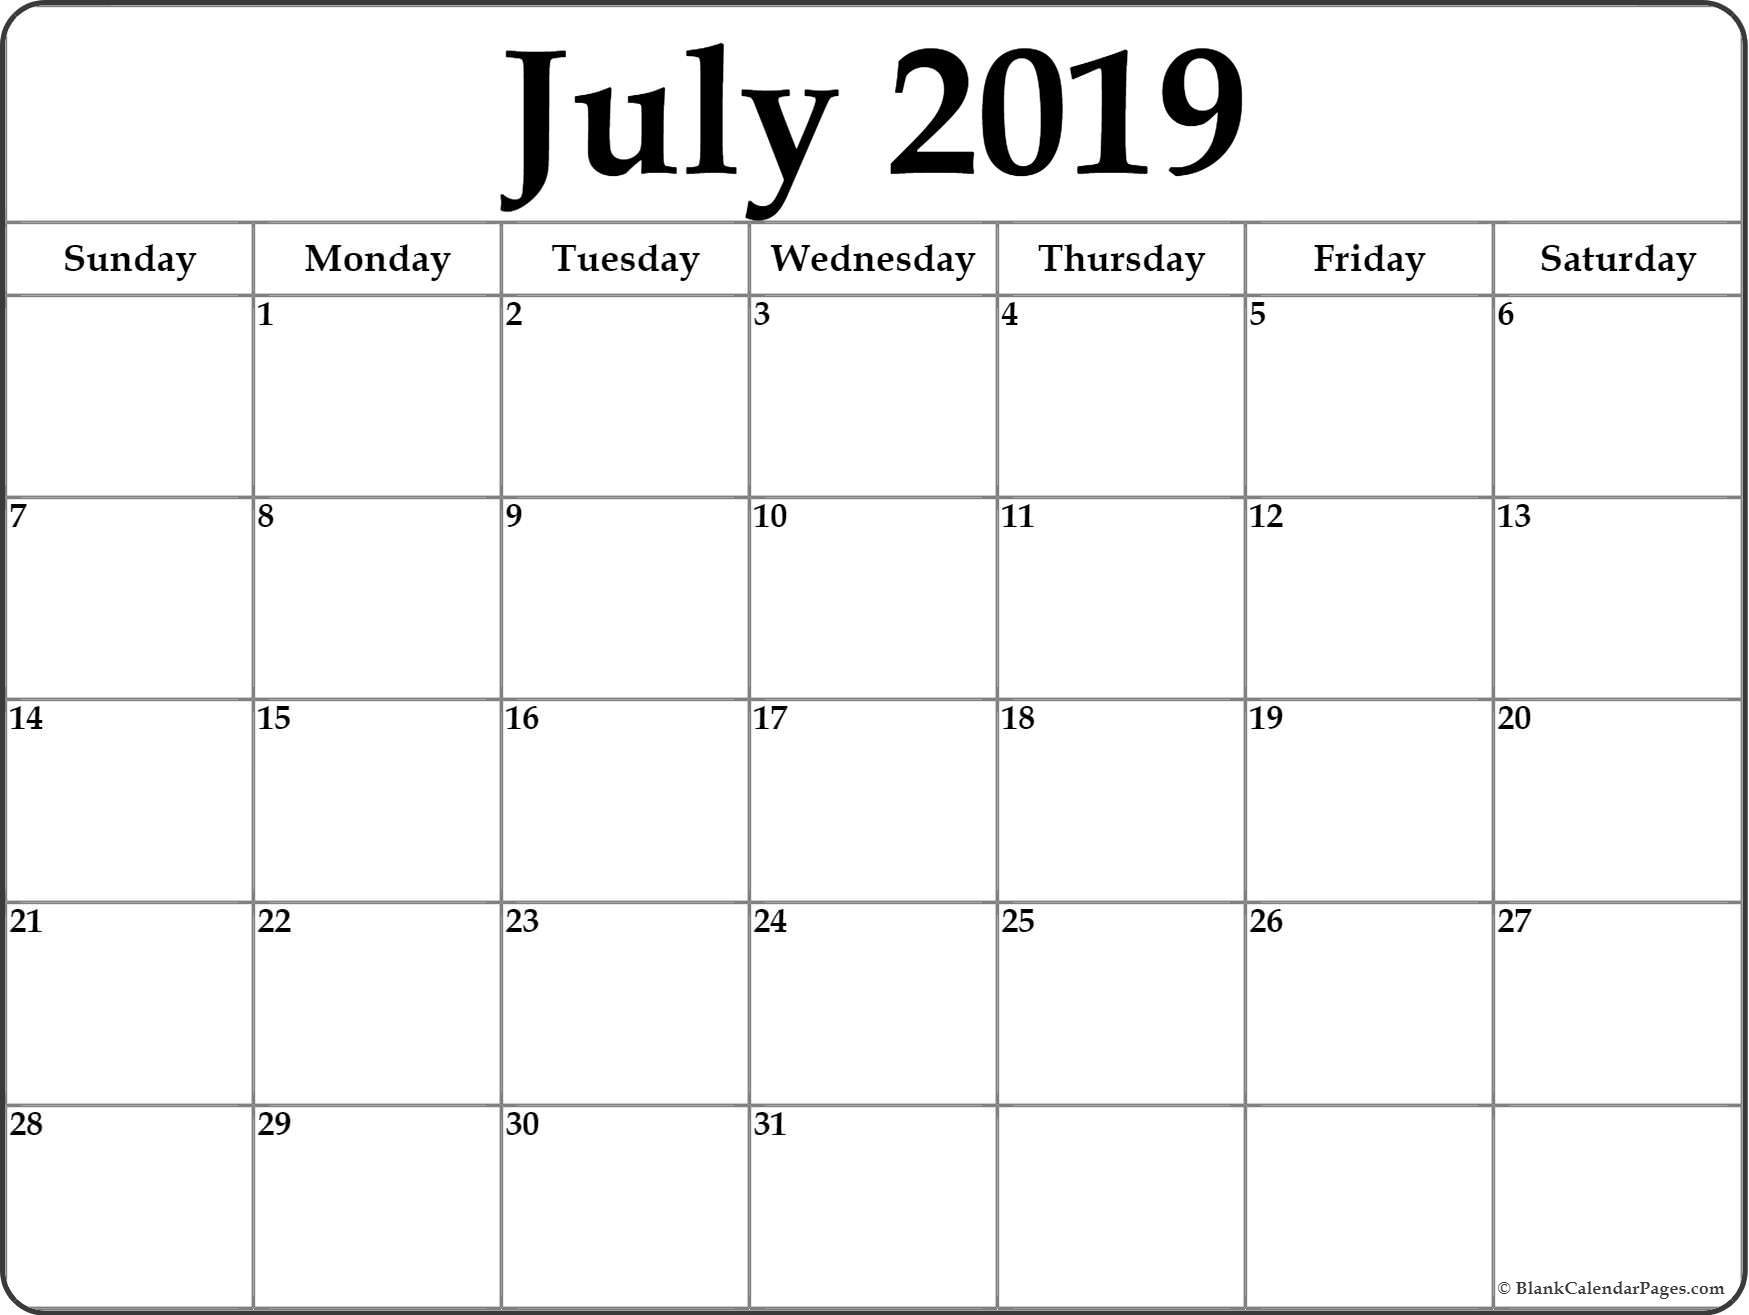 July 2019 Calendar | Free Printable Monthly Calendars-Printable Monthly Calendars For June And July